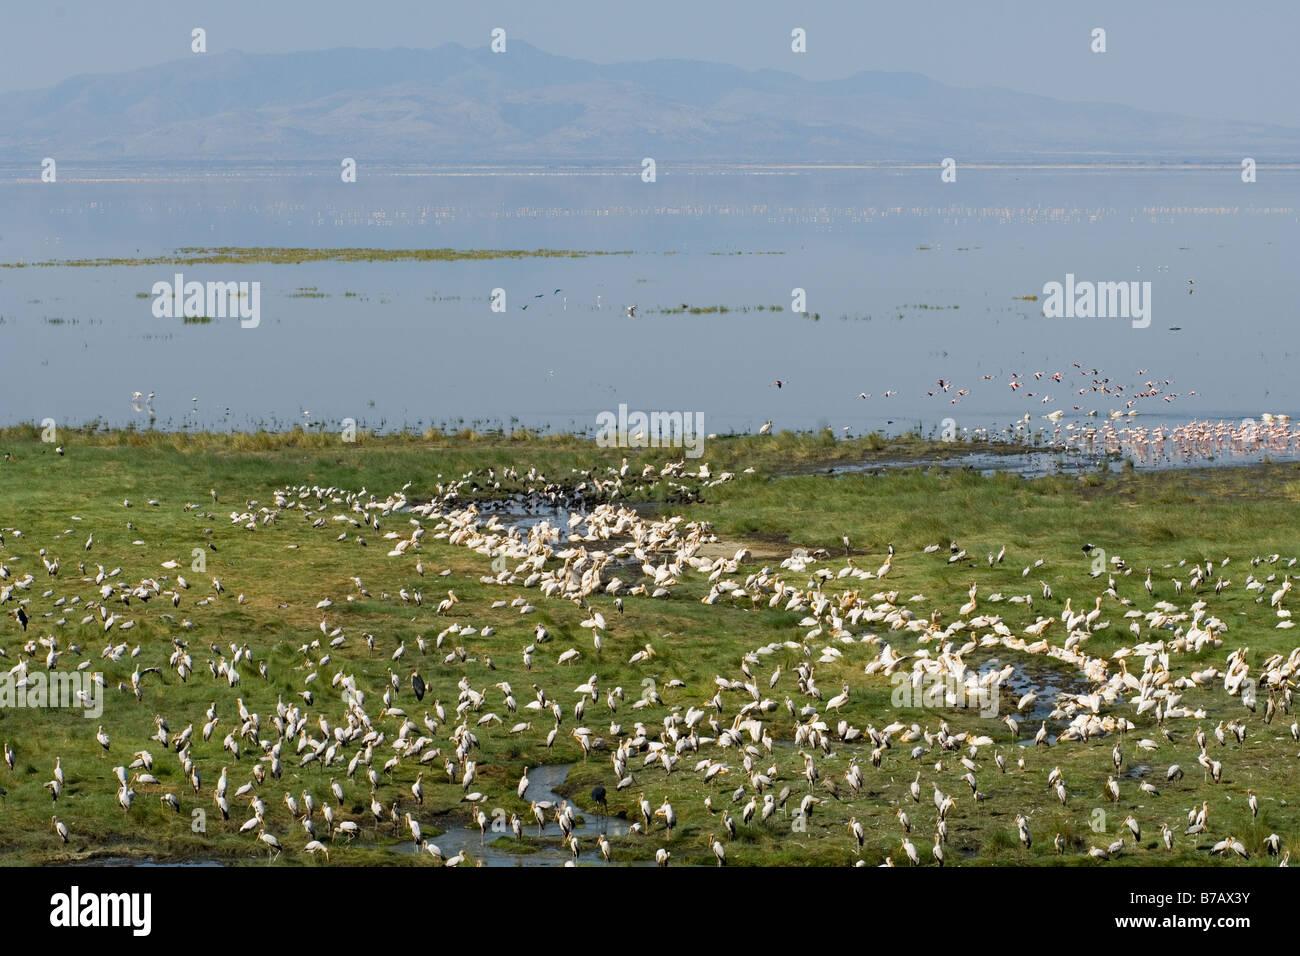 Yellow billed storks Mycteria ibis at the Hot Springs in Lake Manyara National Park Tanzania - Stock Image